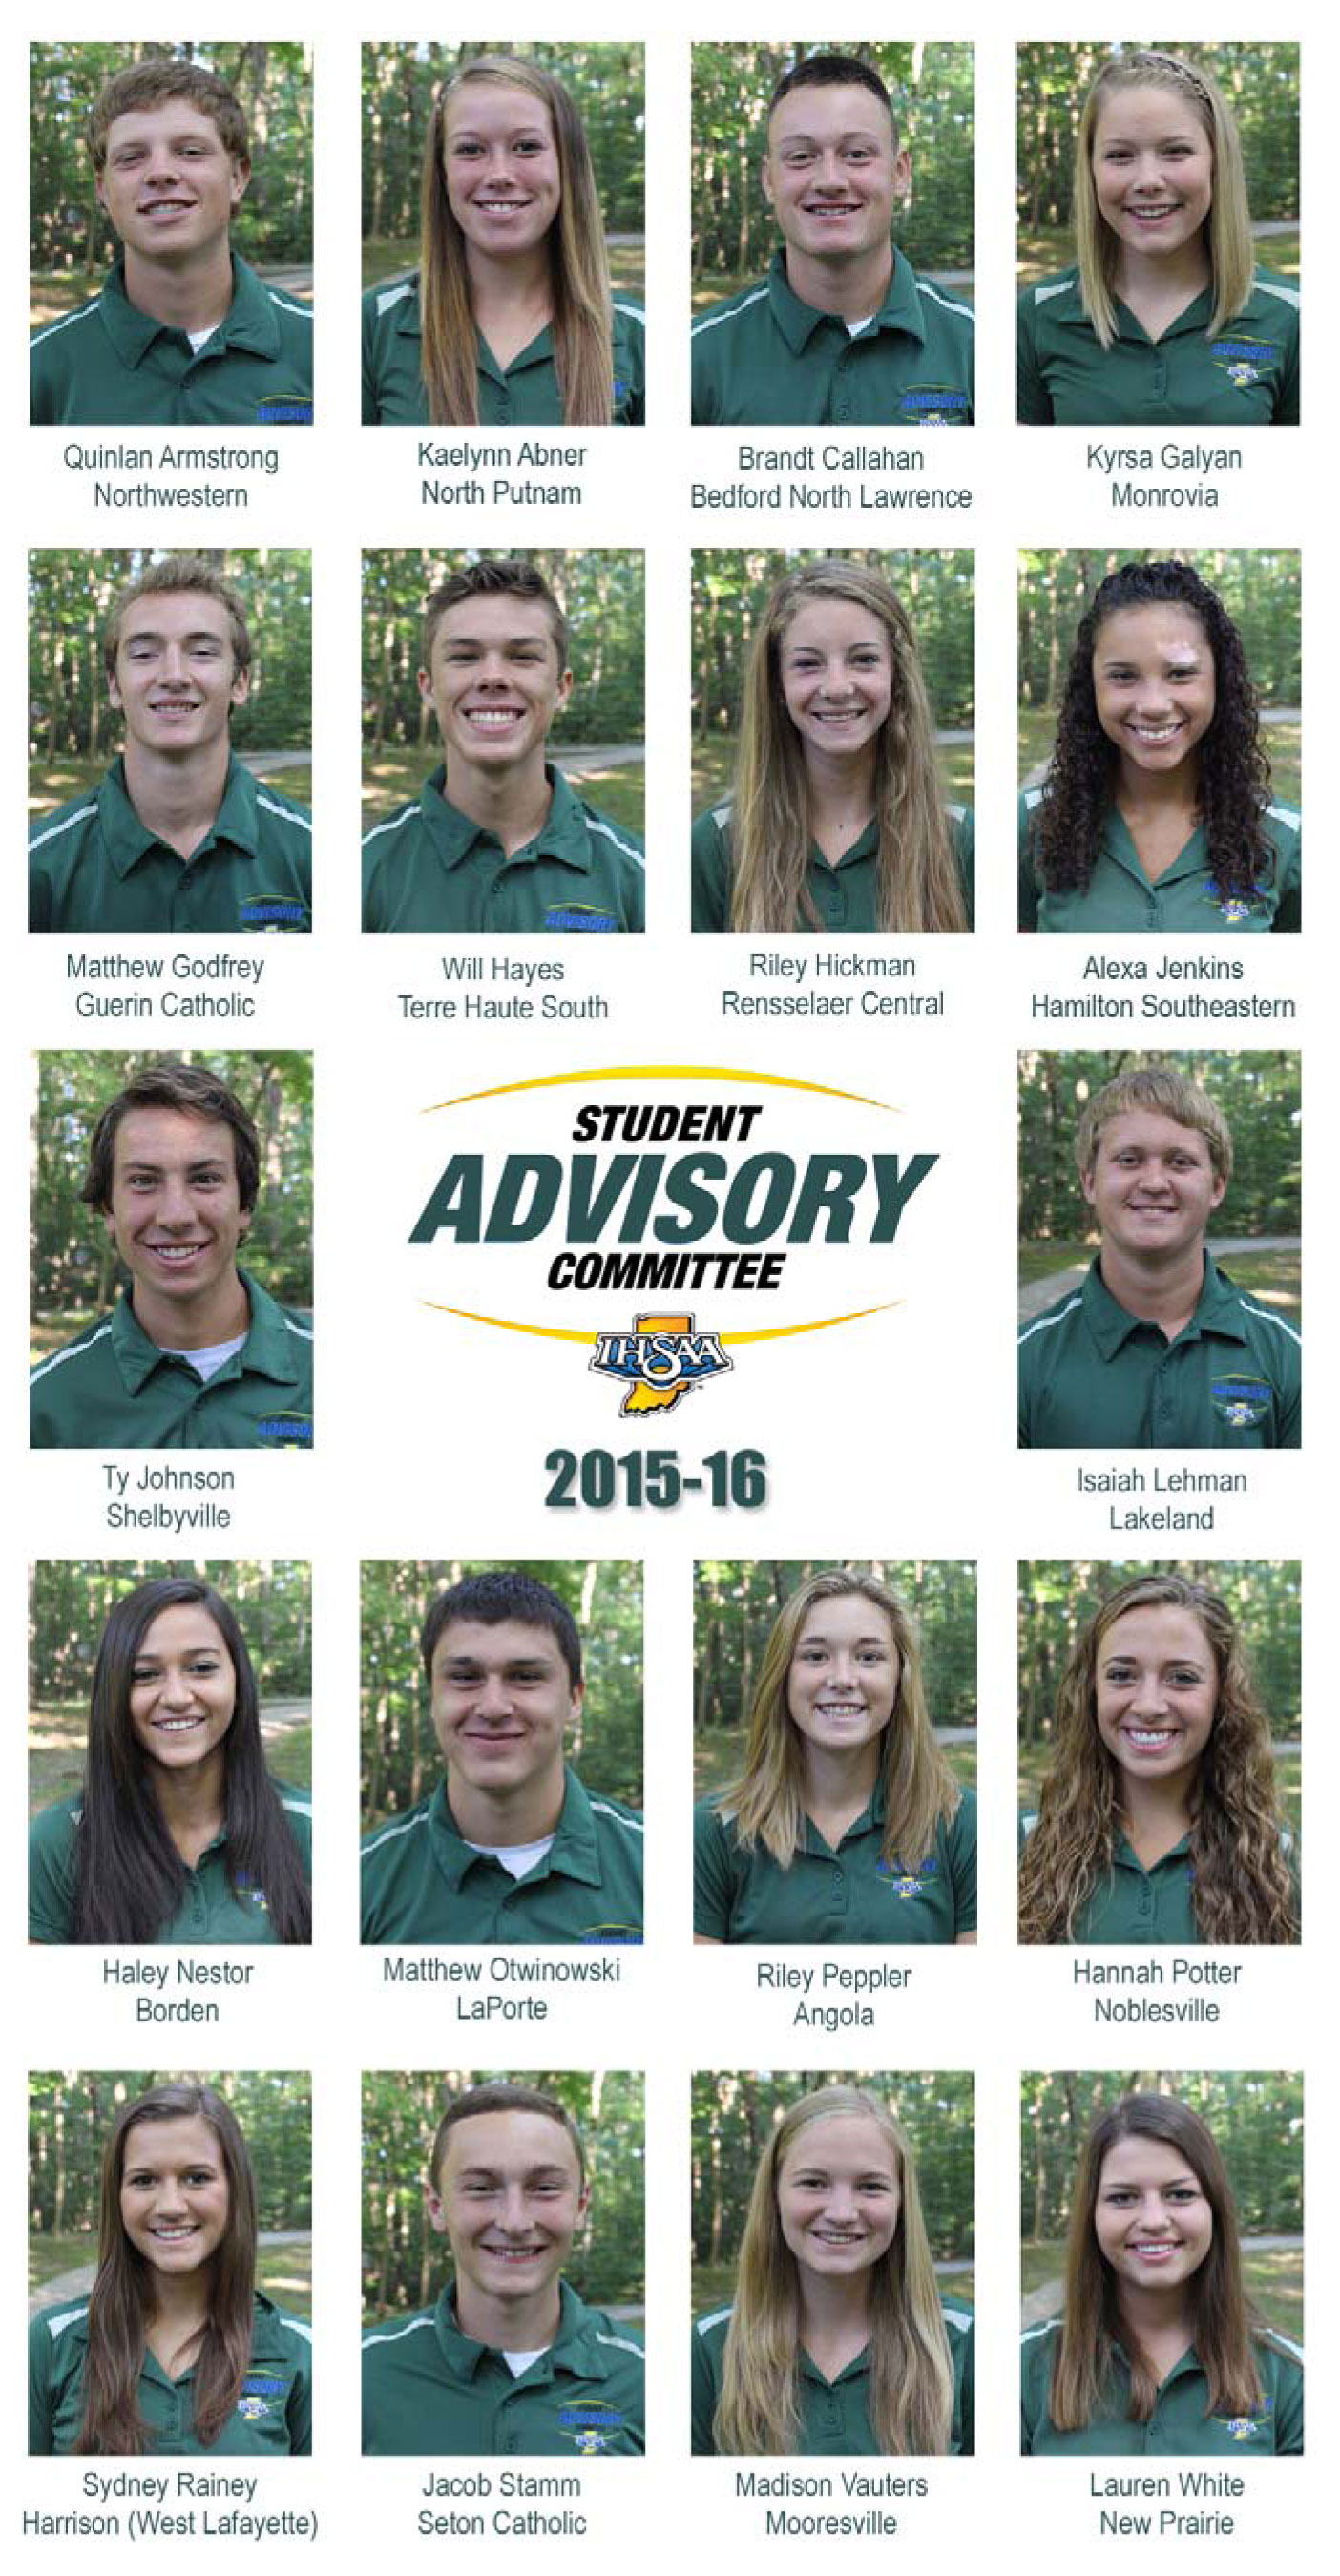 ihsaa-student-advisors-2015